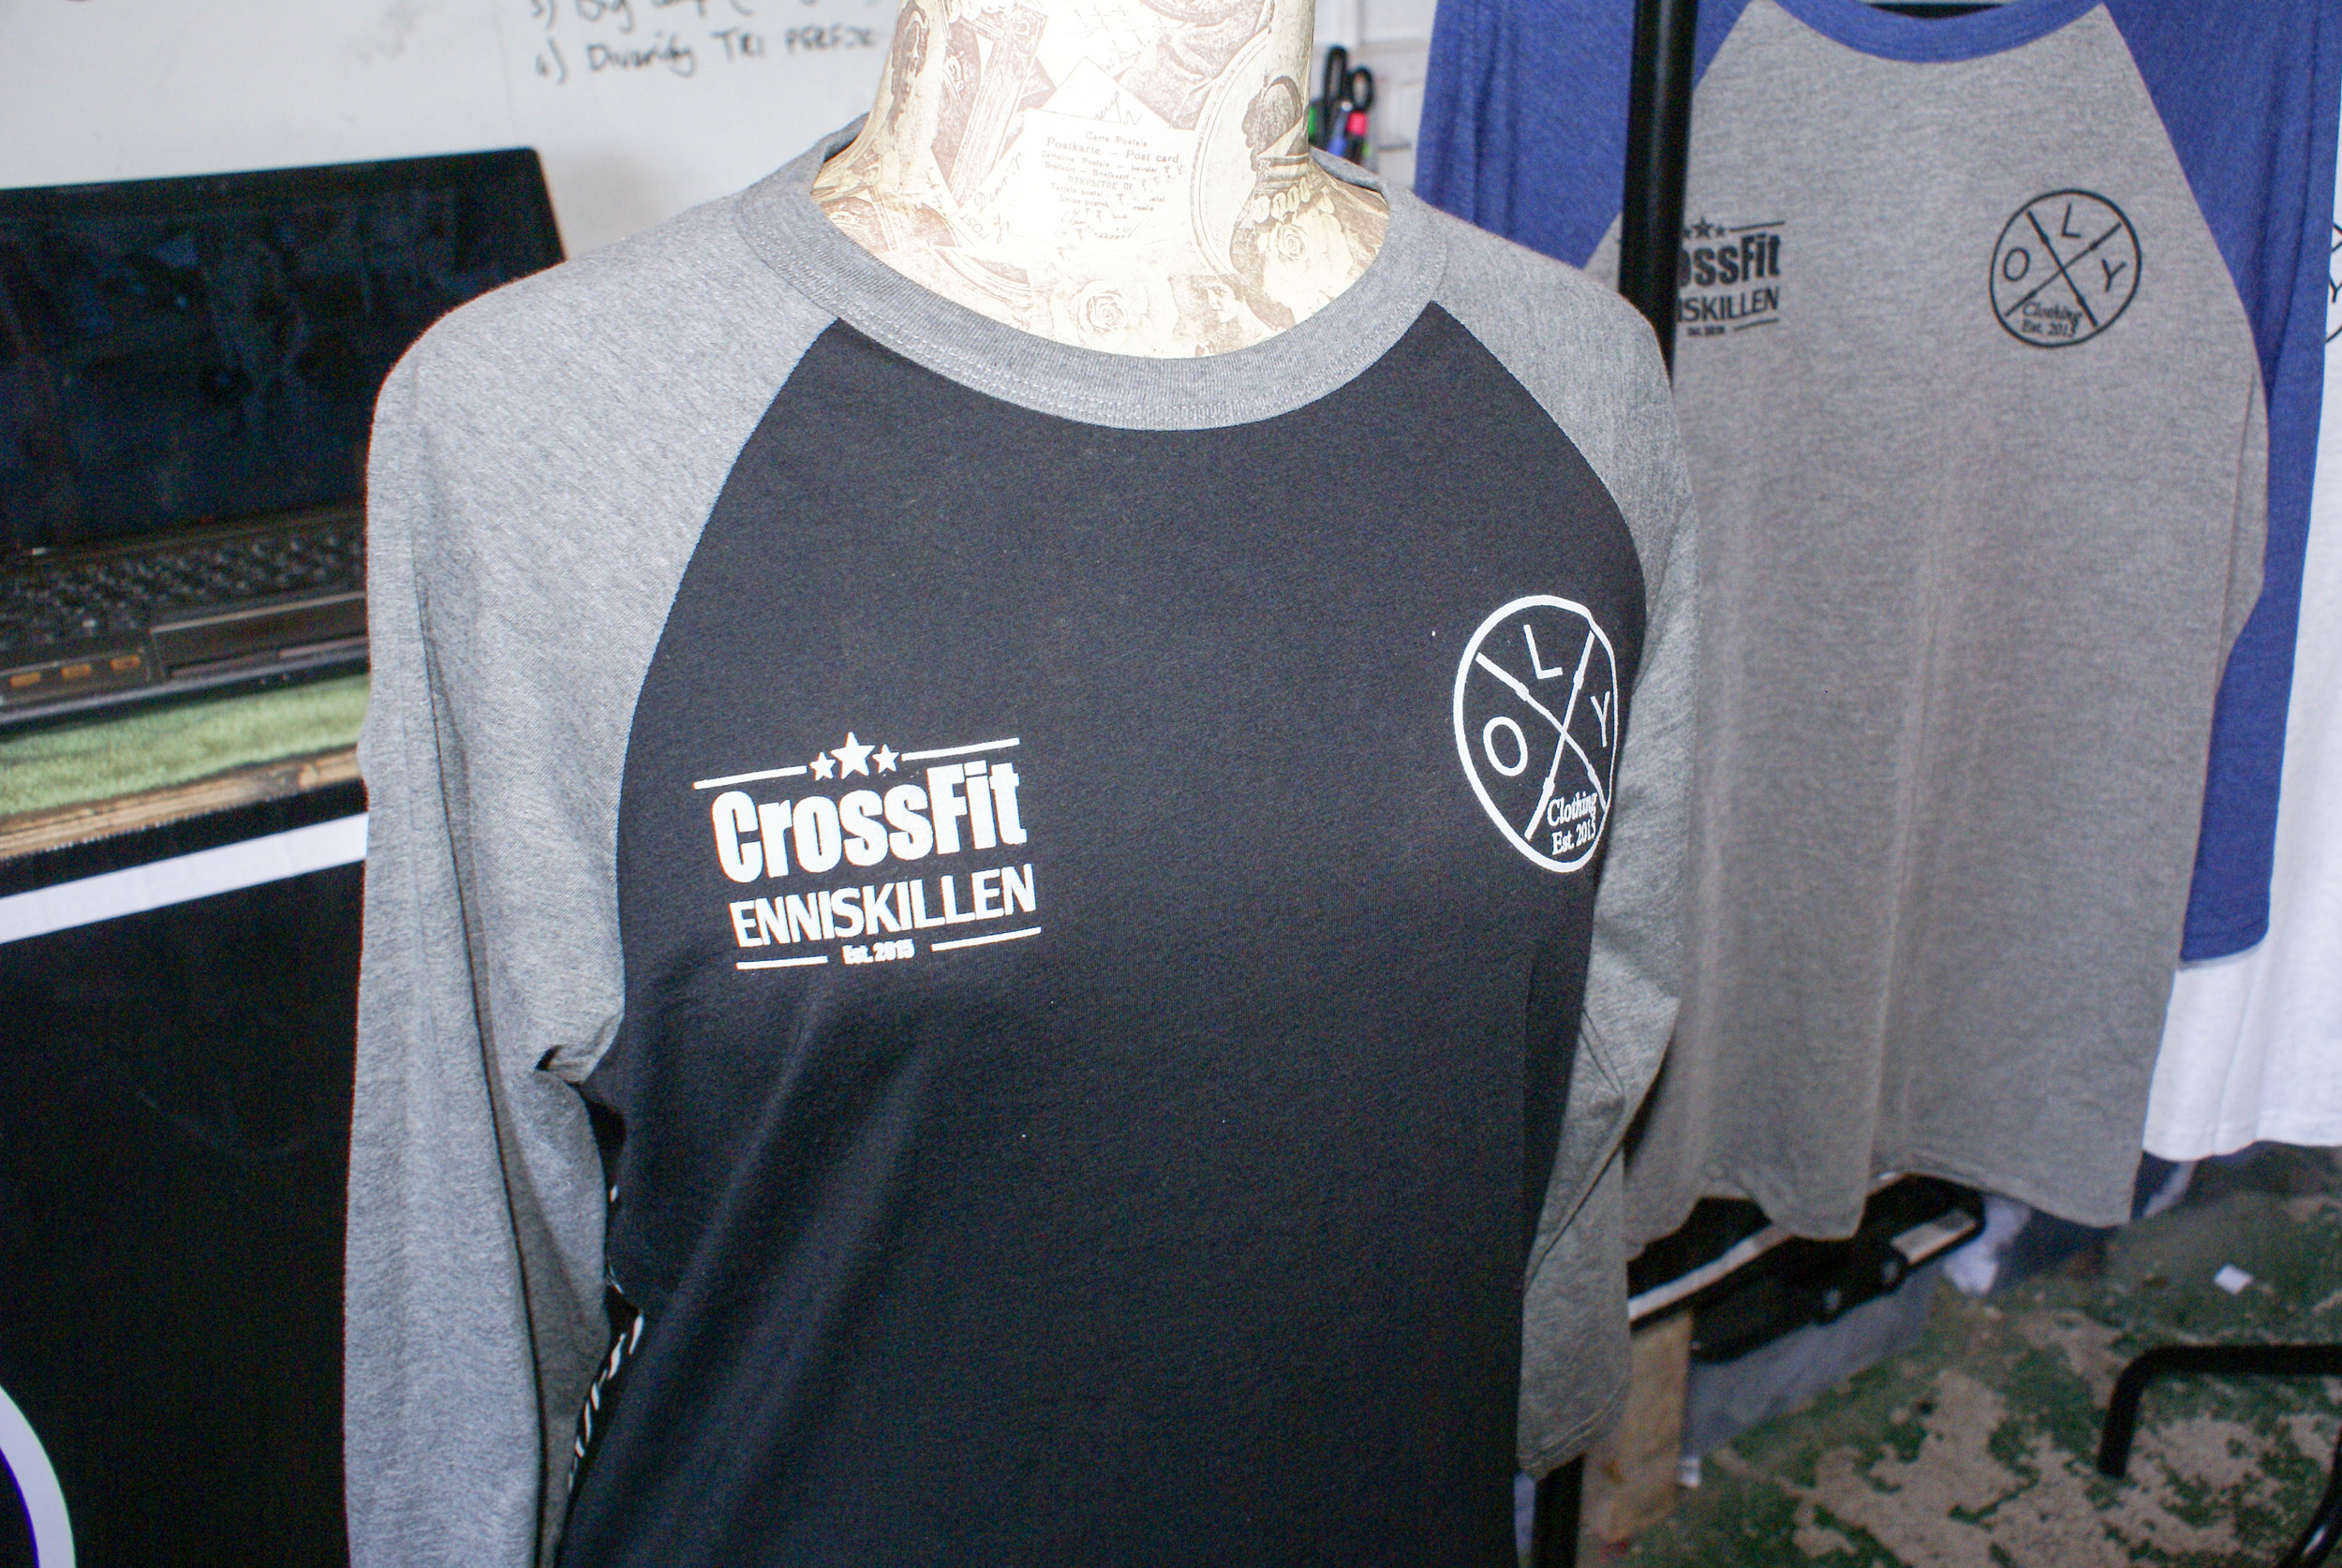 CrossFit-Eniskillen-CA-LR-2.jpg